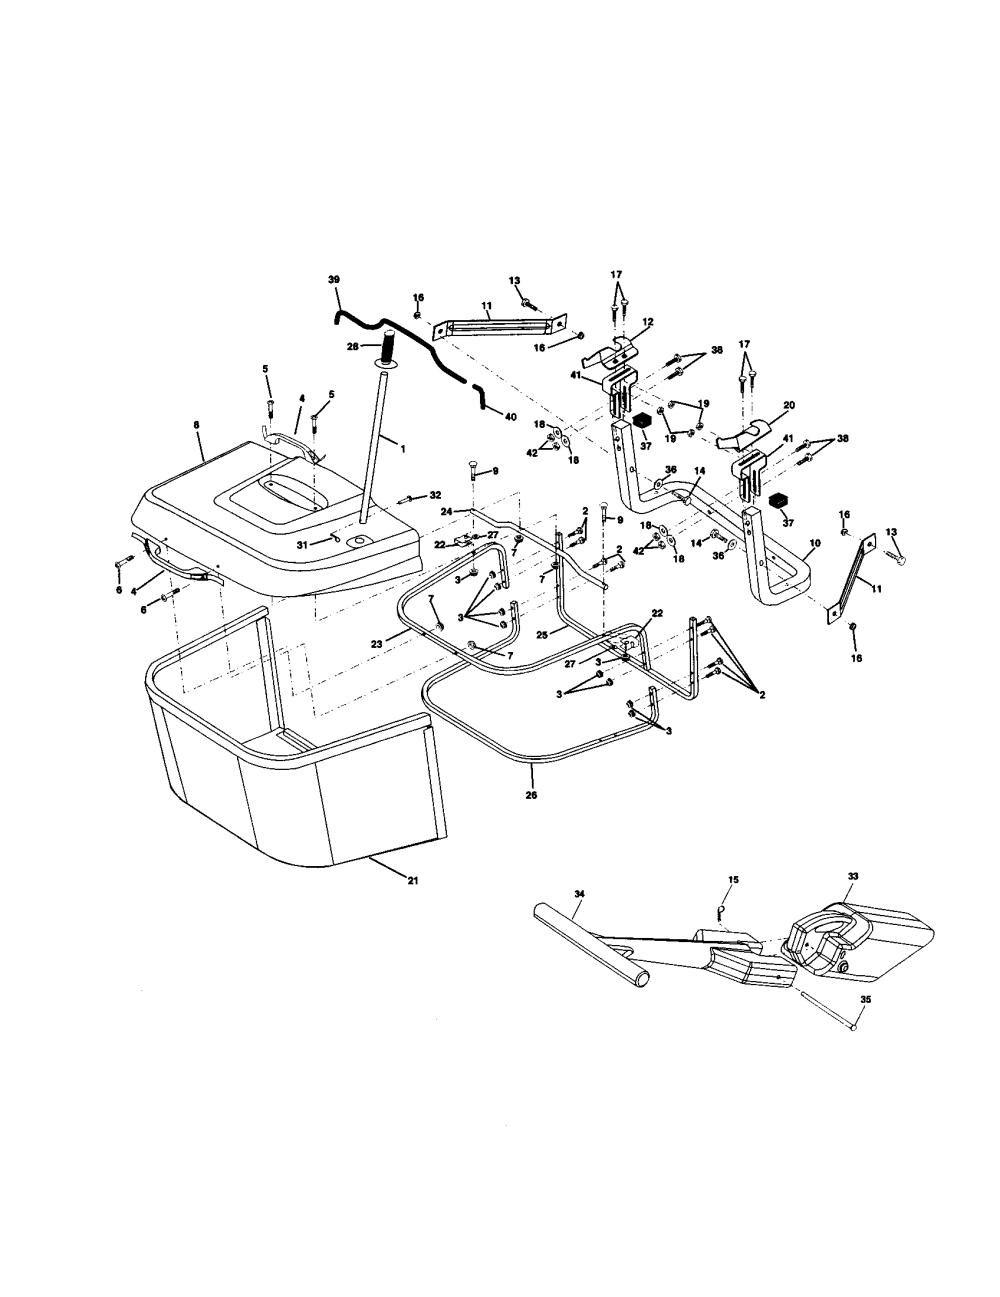 medium resolution of craftsman 917259462 bagger diagram